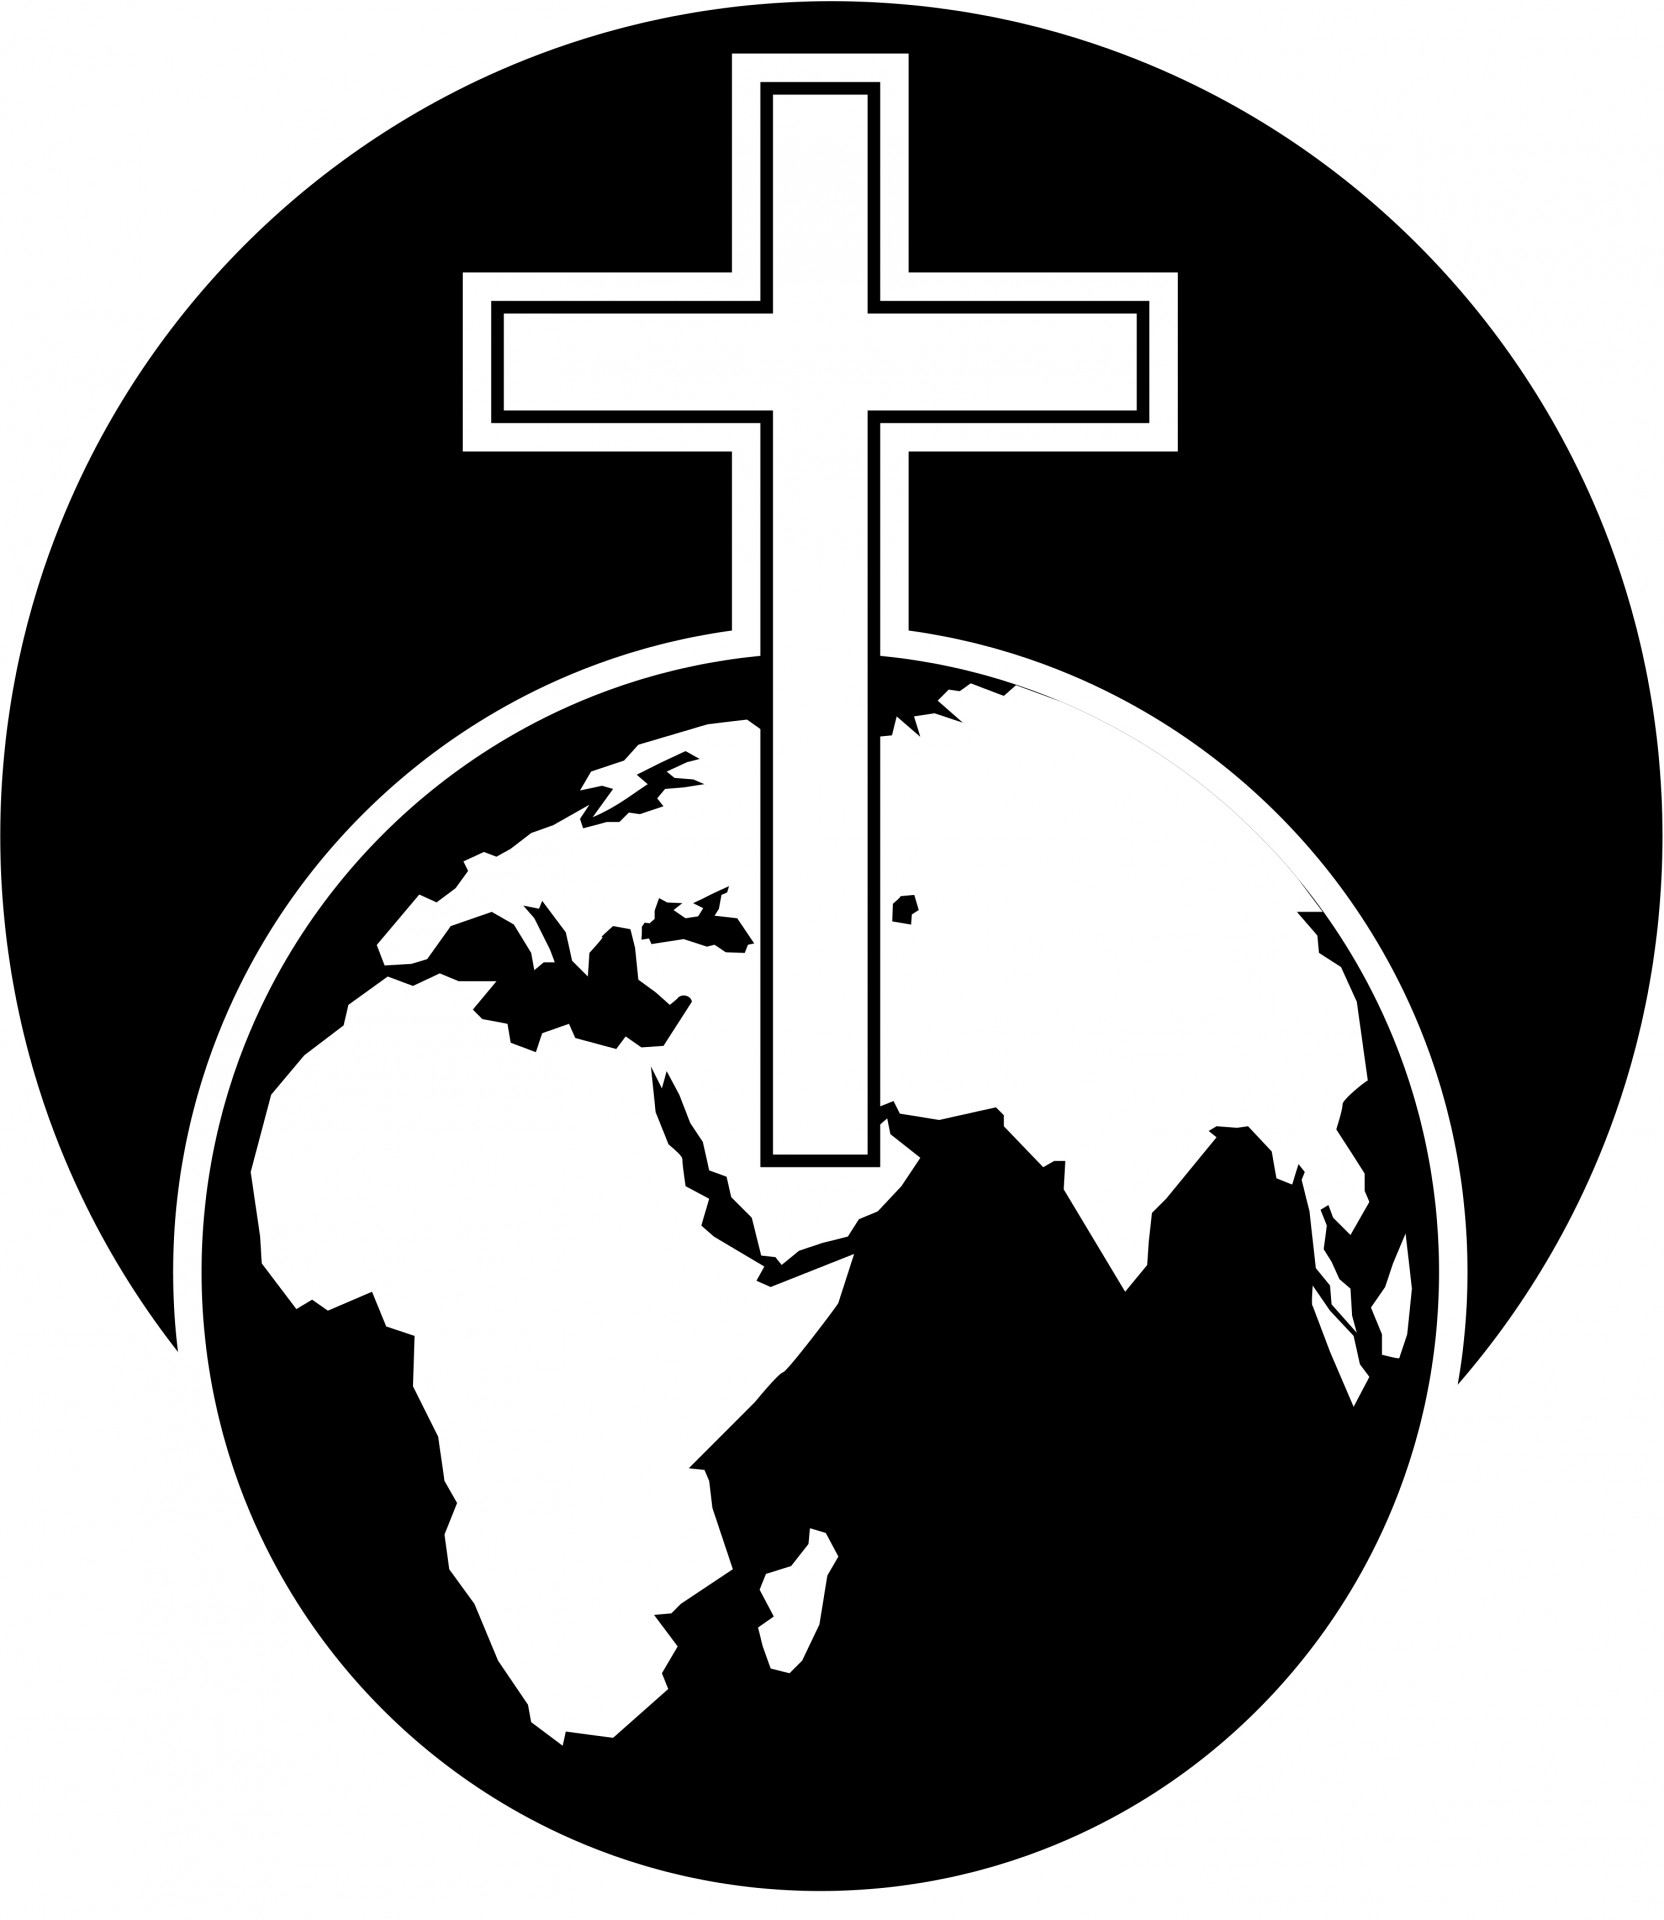 Cross clipart christianity. Christian free stock photo